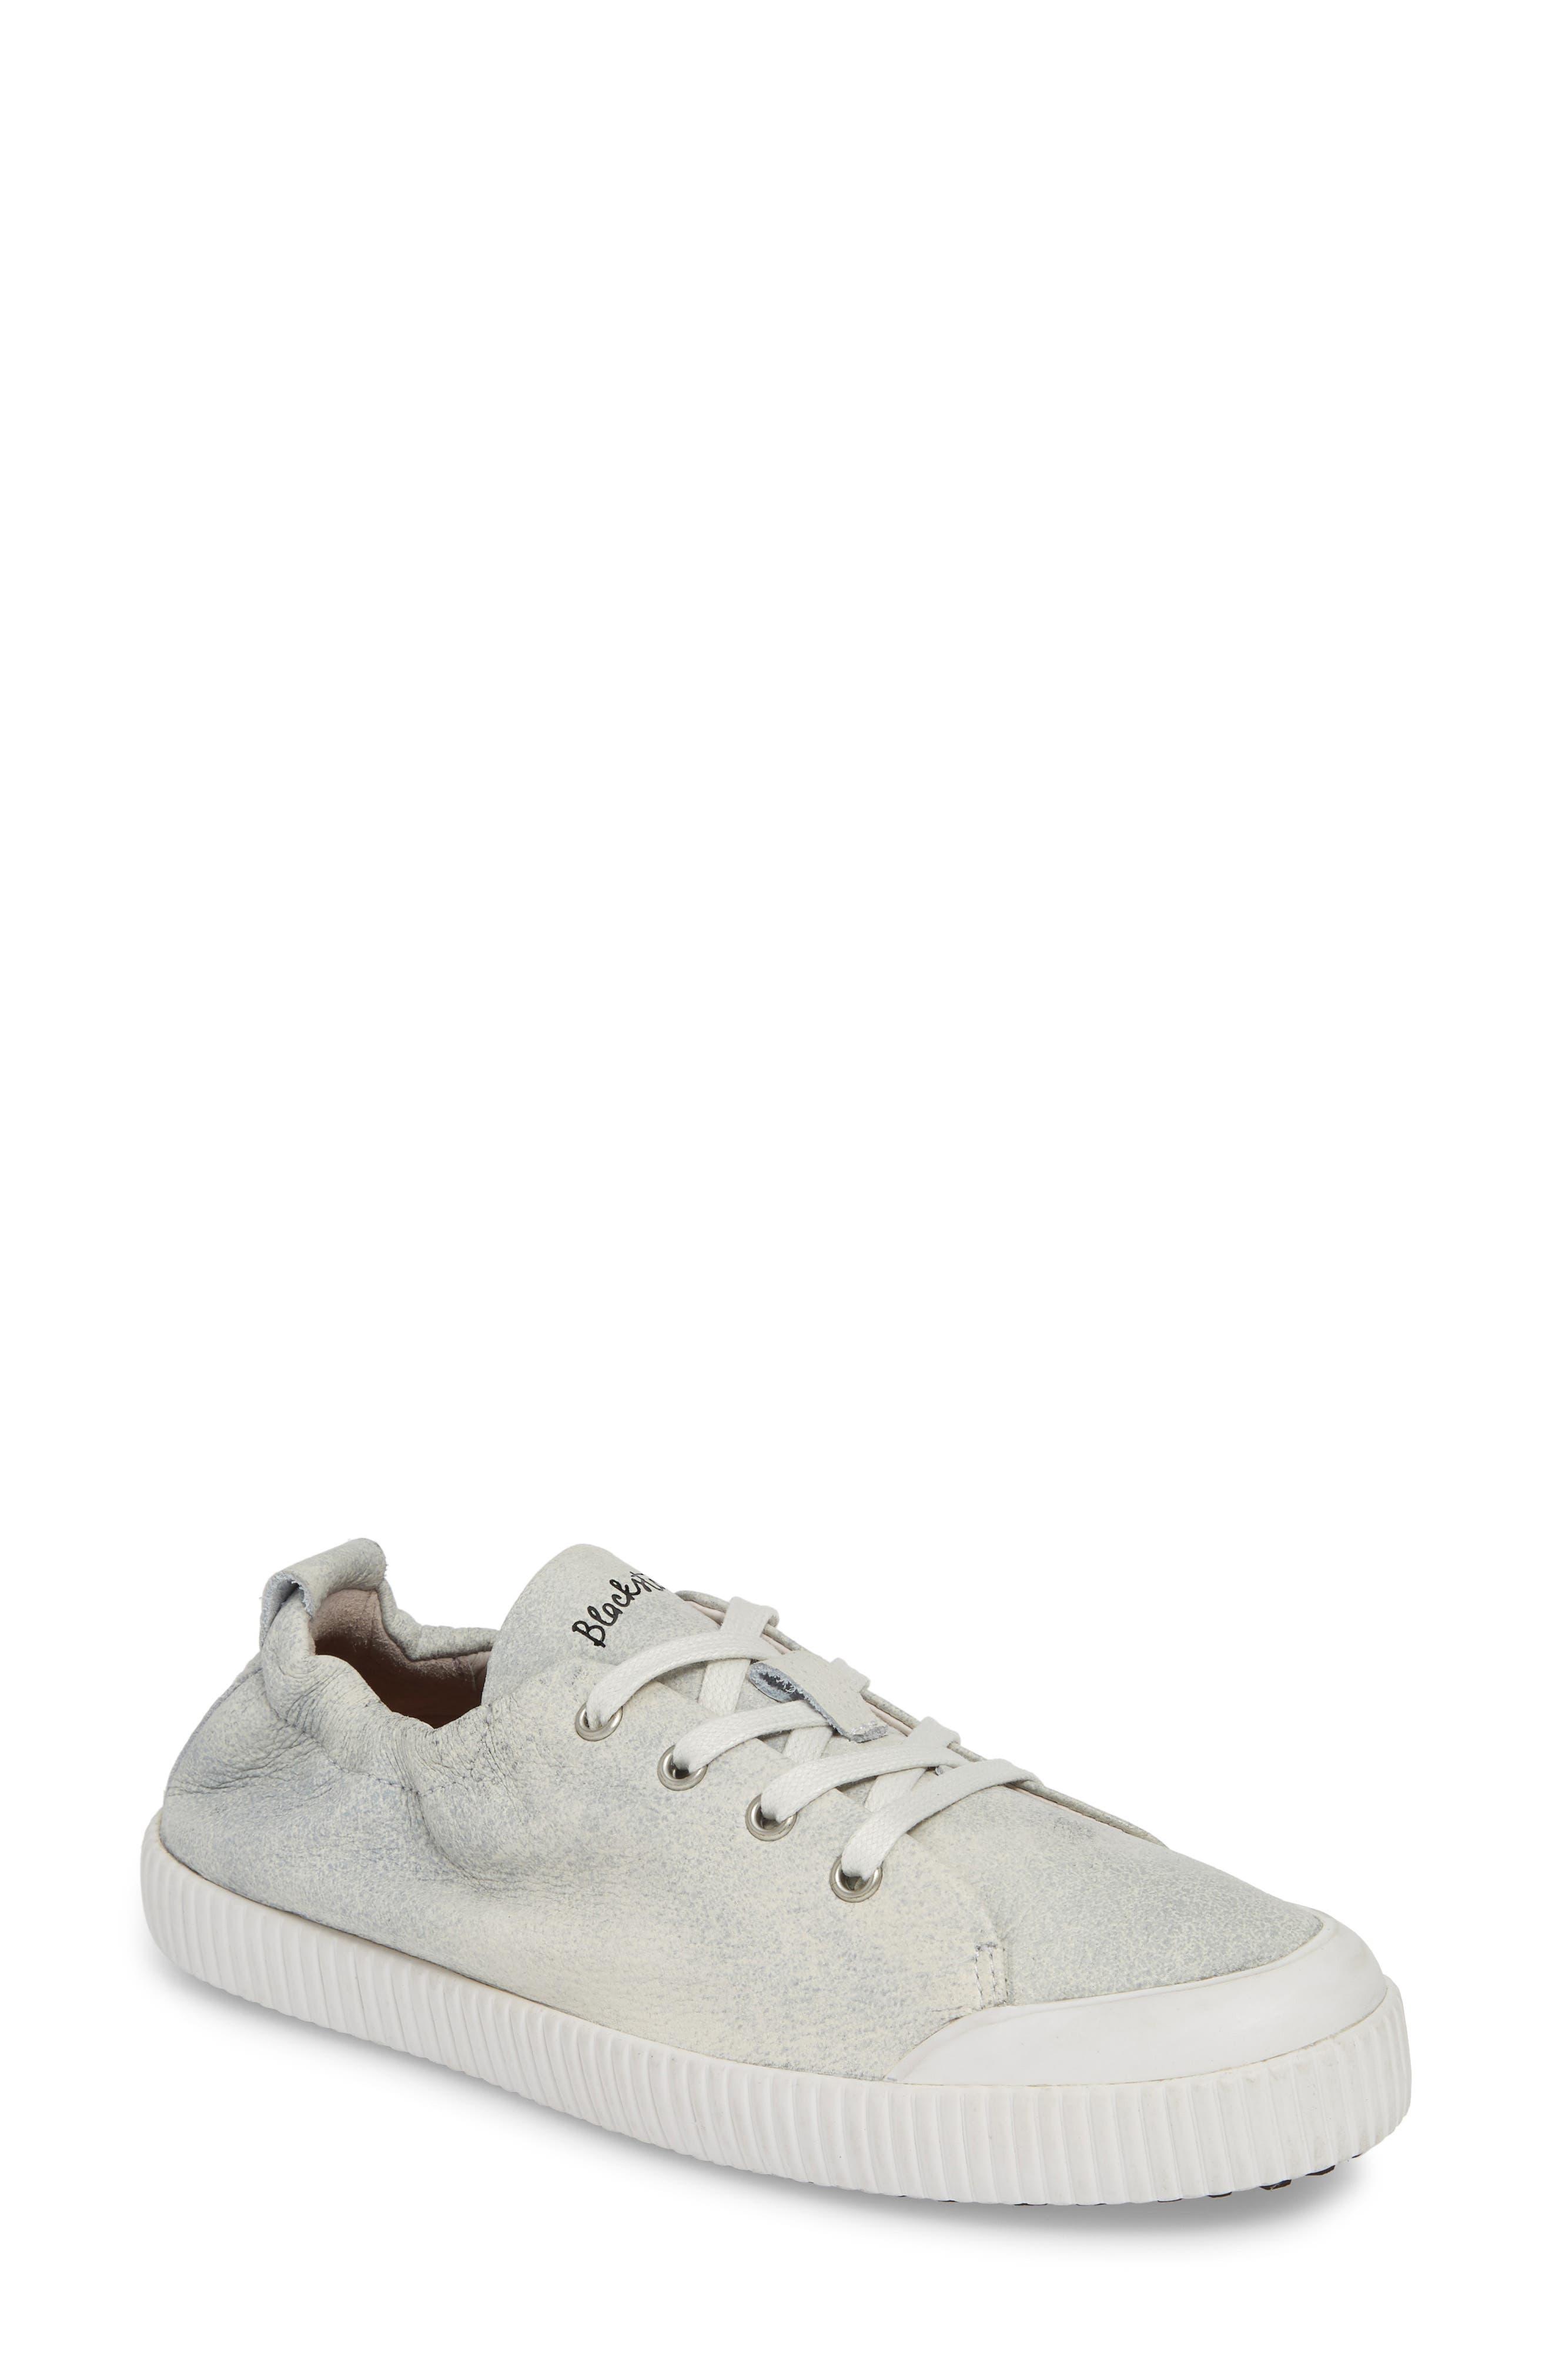 Blackstone Rl78 Low Top Sneaker, Metallic